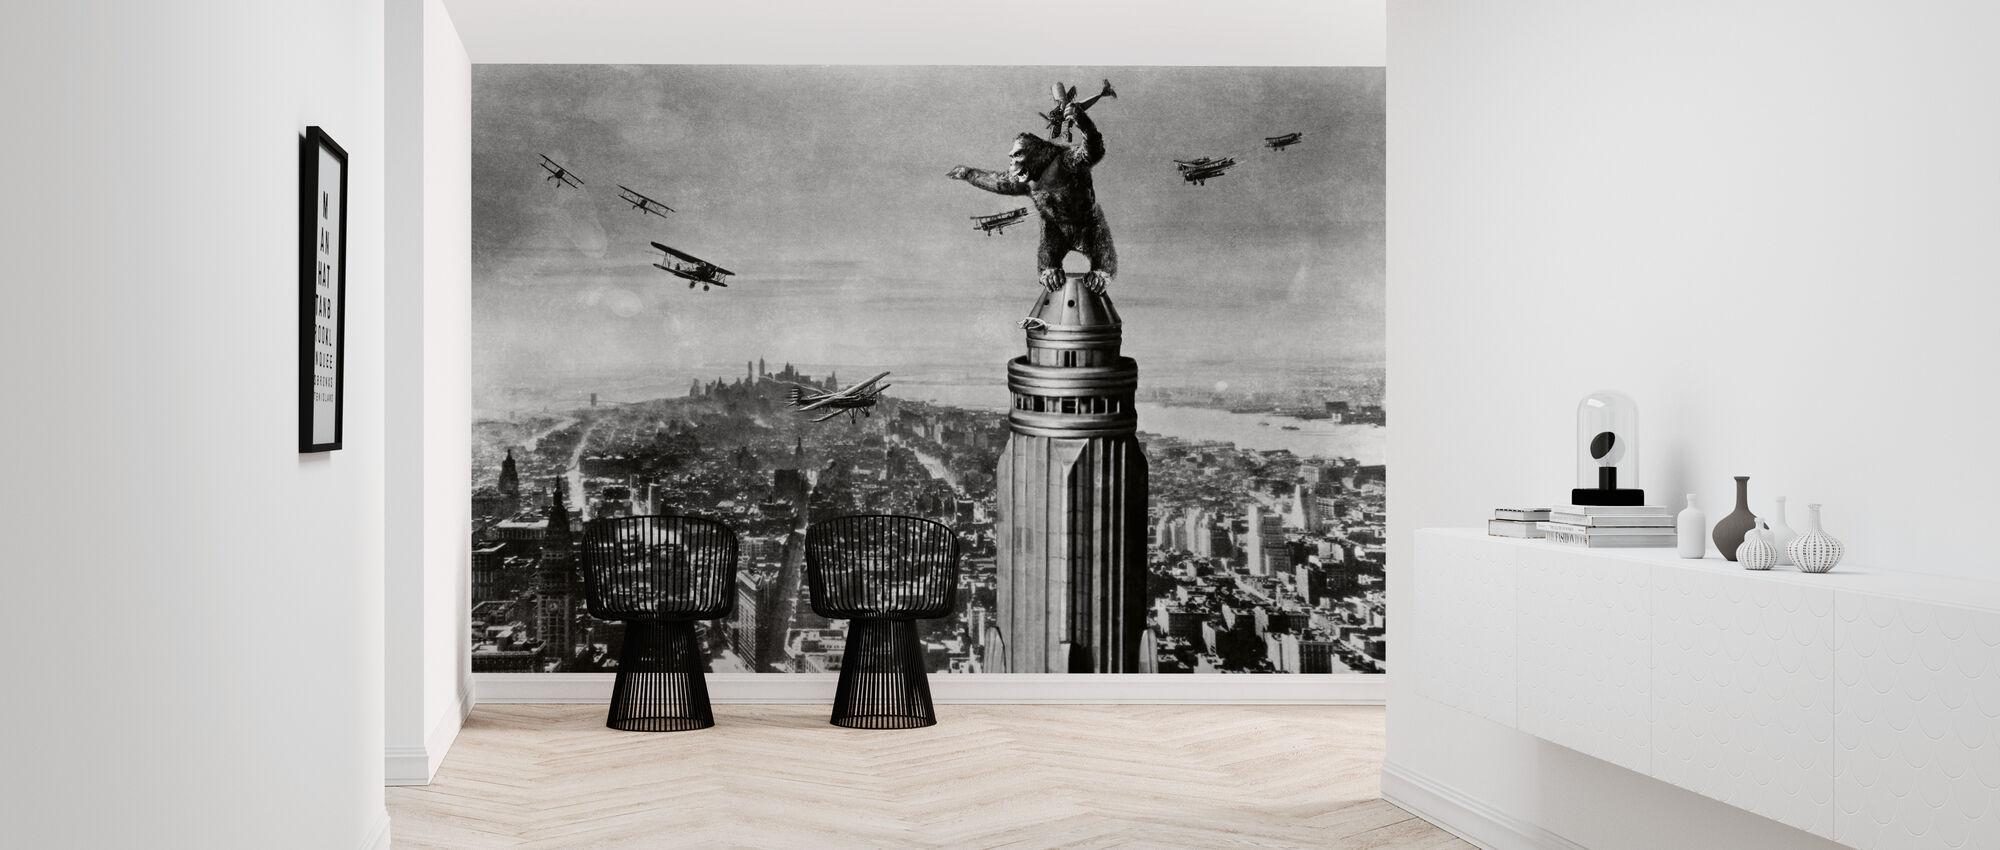 King Kong - Wallpaper - Hallway